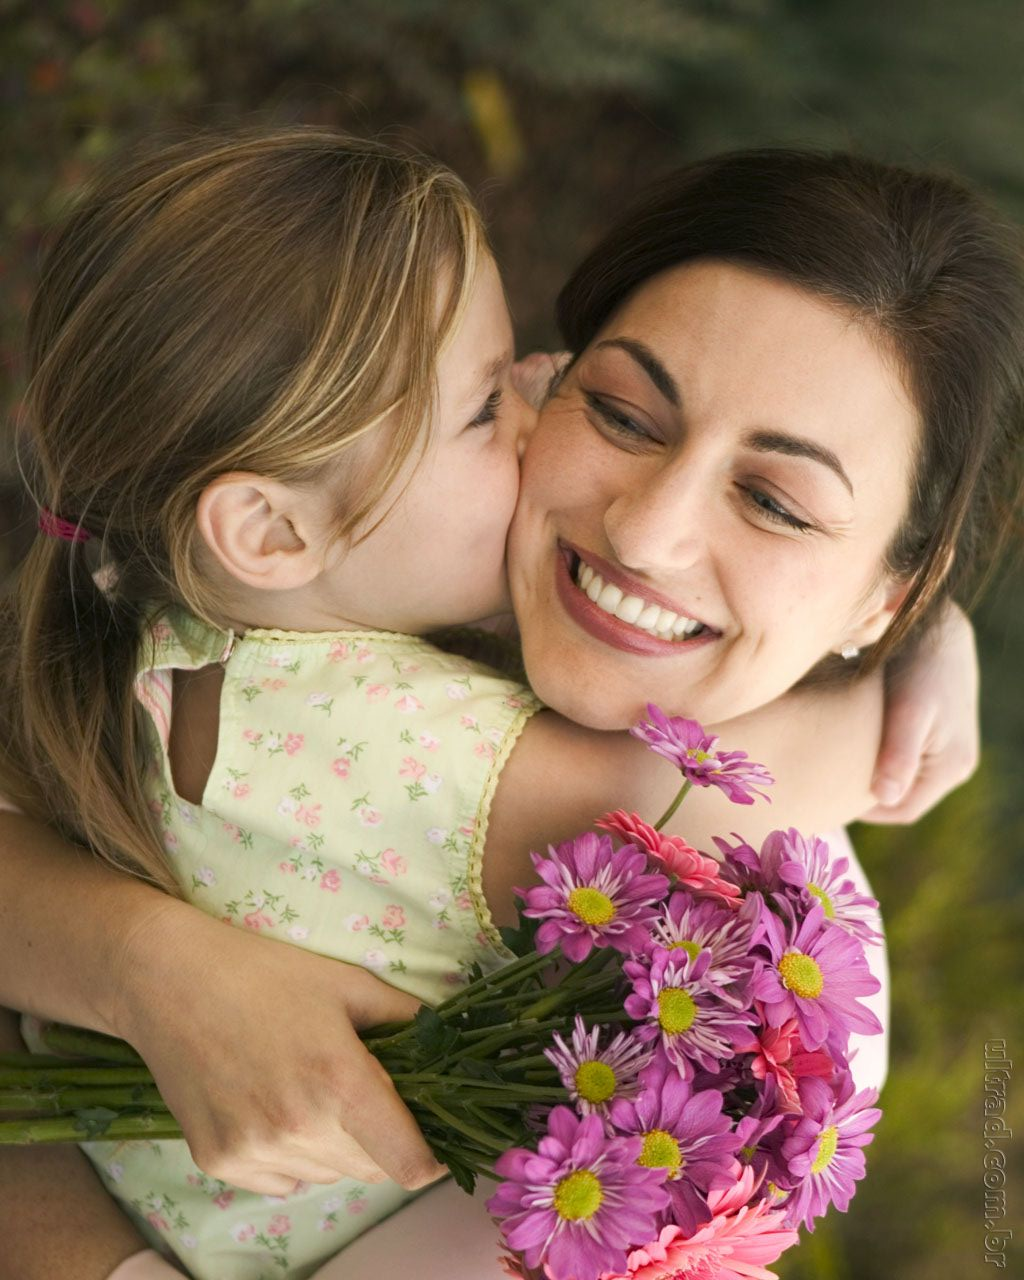 Mãe: Amor na hora certa